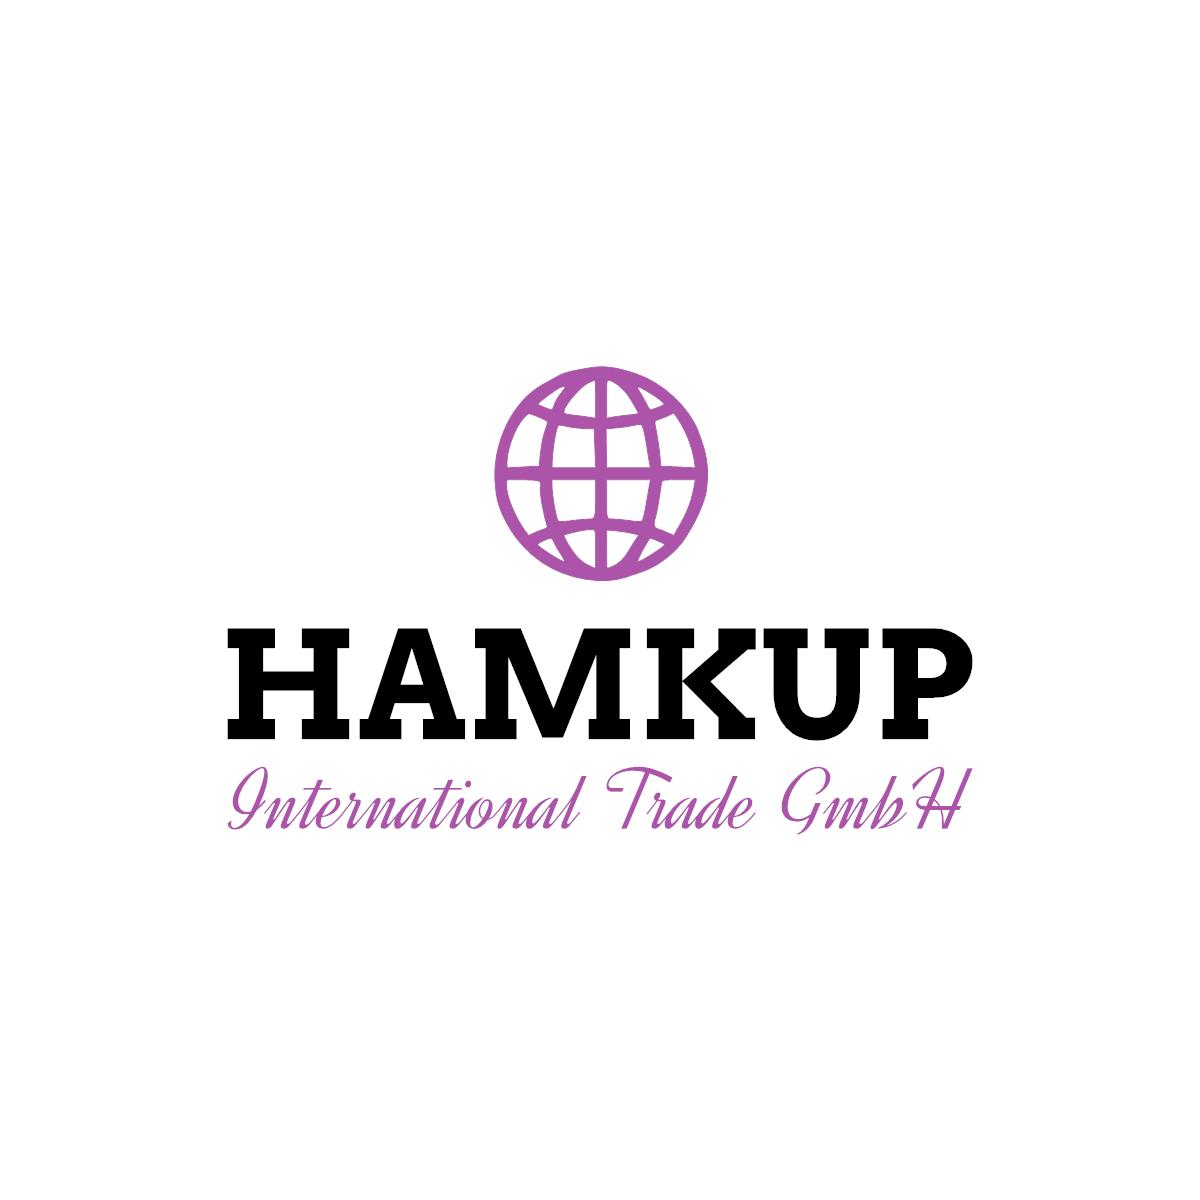 Hamkup International Trade GmbH